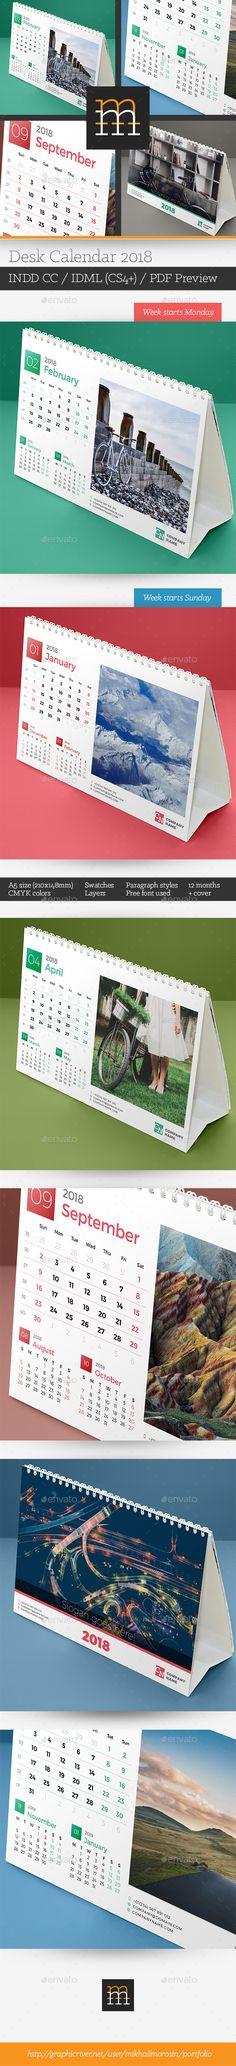 Desk #Calendar 2018 - Calendars #Stationery Download here: https://graphicriver.net/item/desk-calendar-2018/20241647?ref=alena994